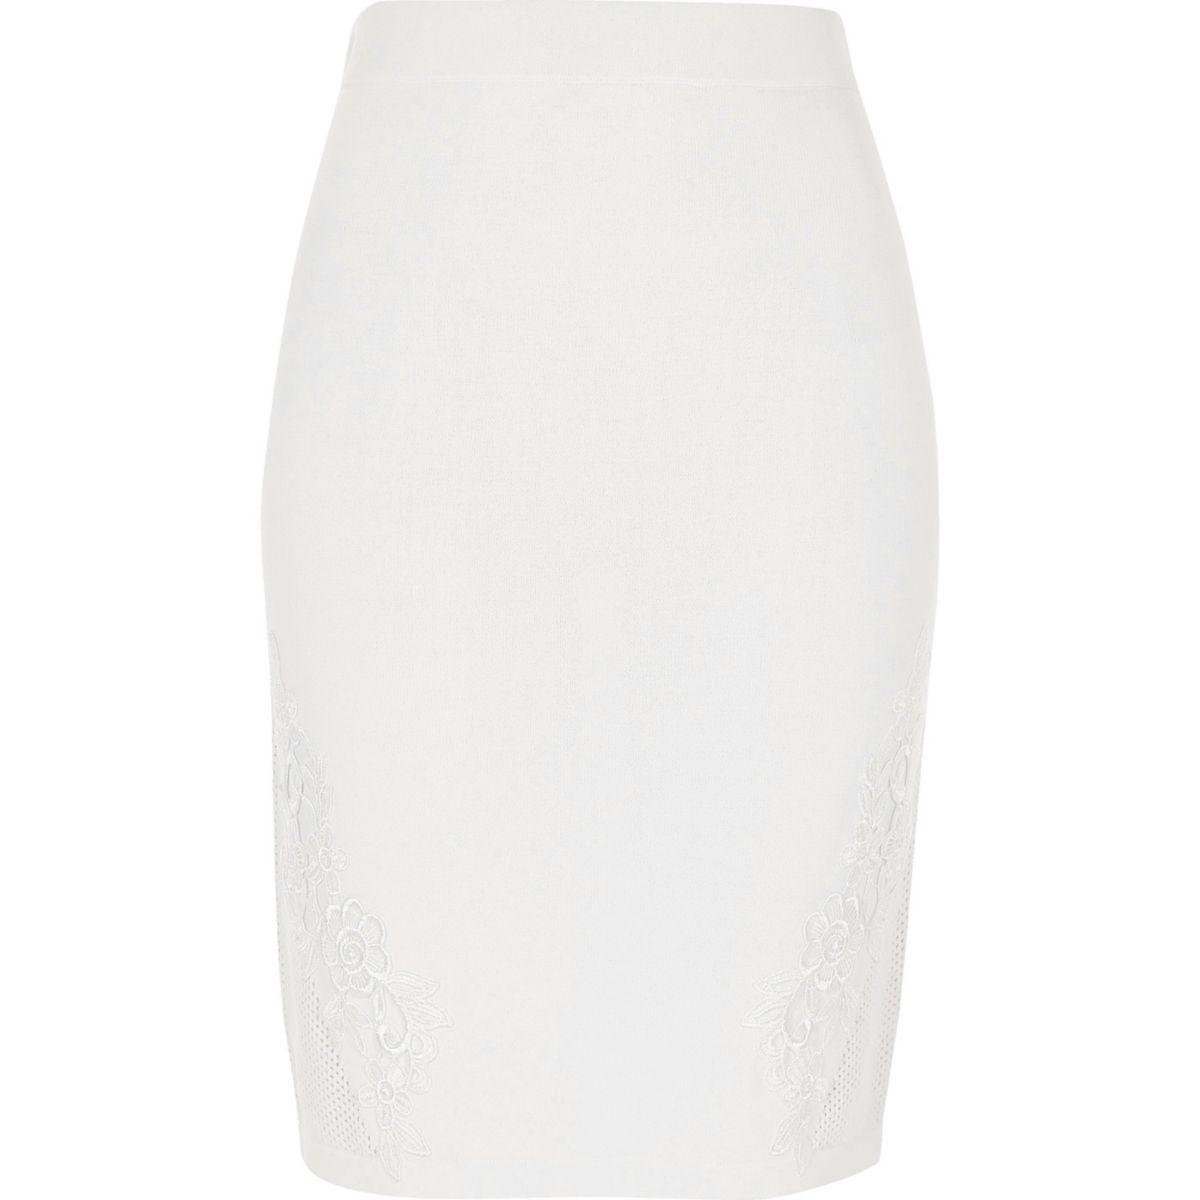 White knit floral appliqué bodycon skirt